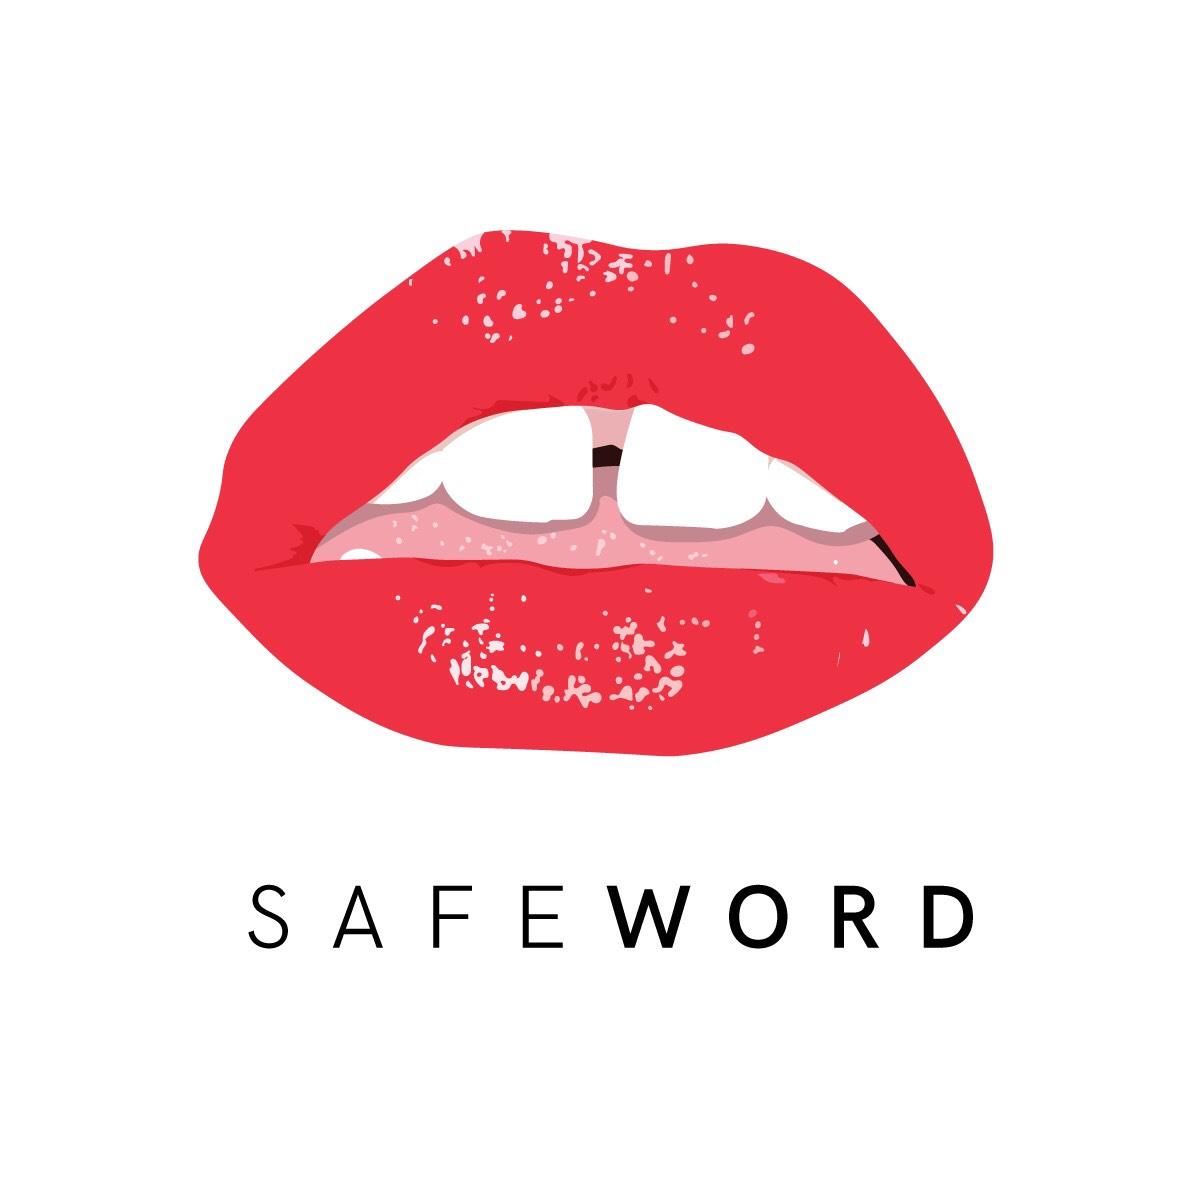 Logo by Justine Henderson